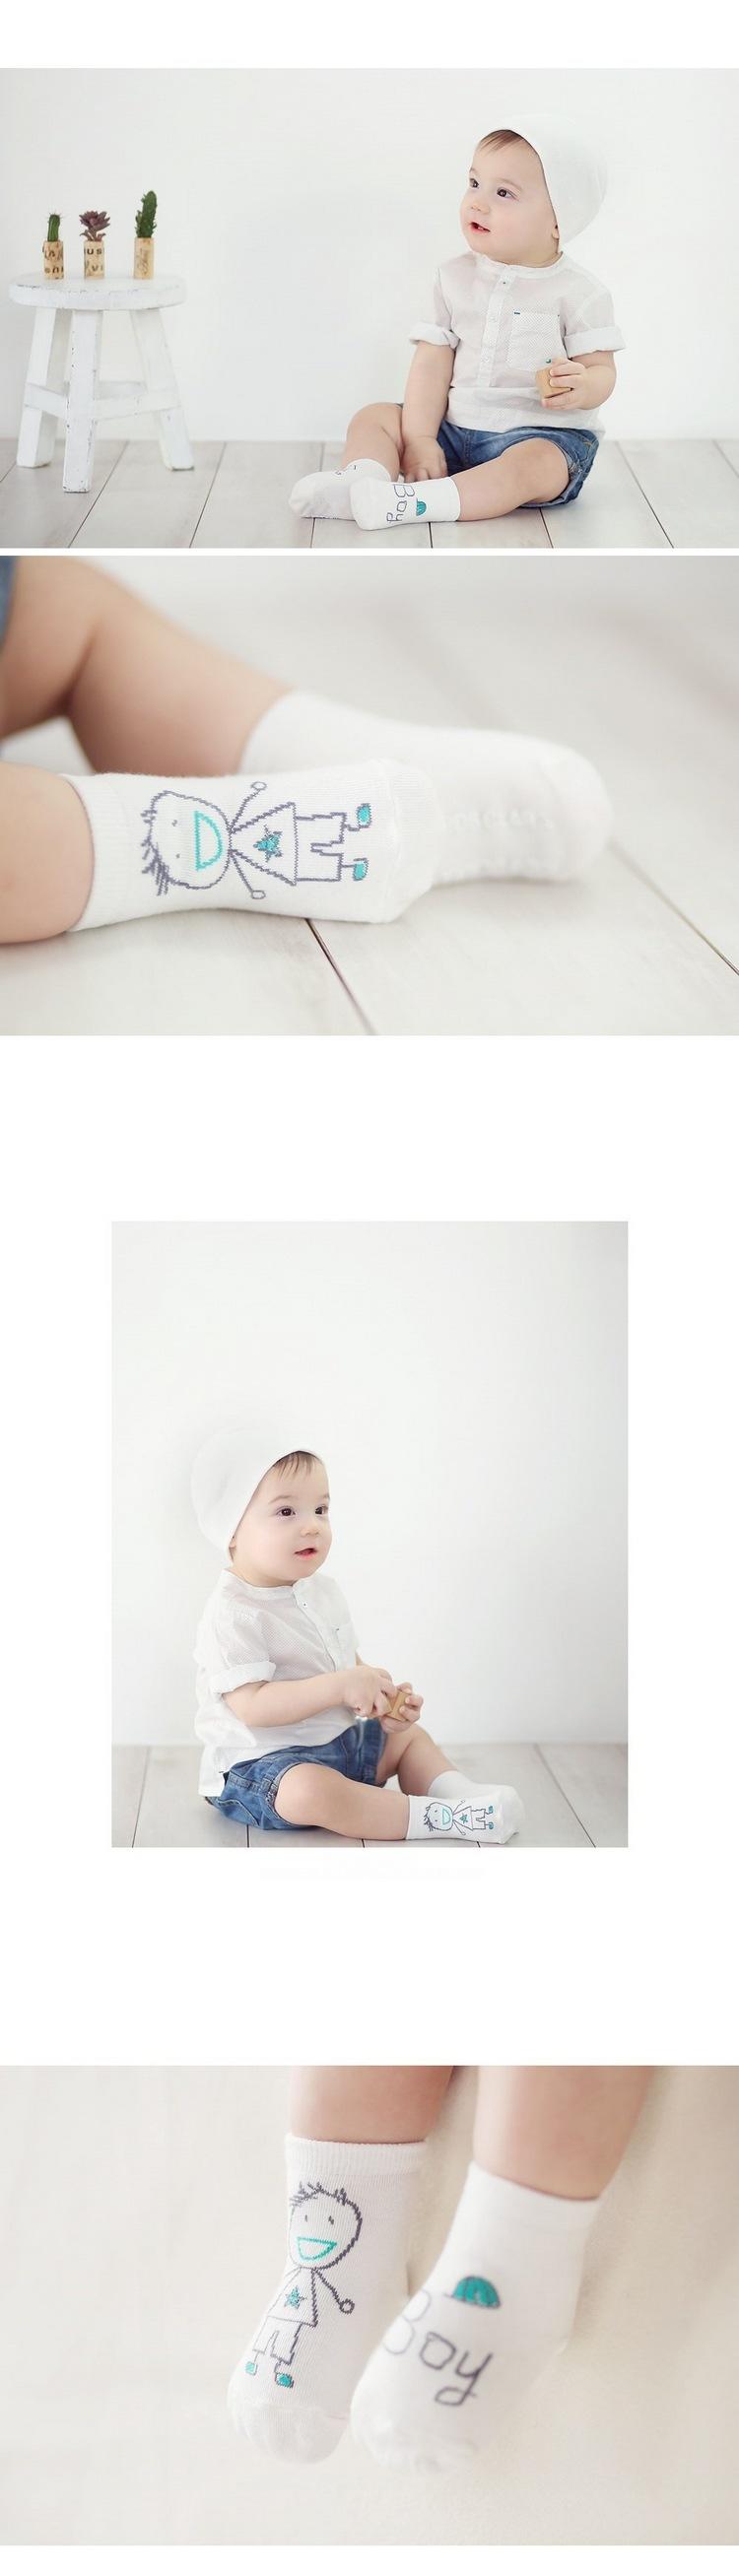 2016 Spring/autumn New Character Novelty Unisex Baby Socks Newborn Cotton Boys Girls Cute Toddler Asymmetry Anti-slip Sock